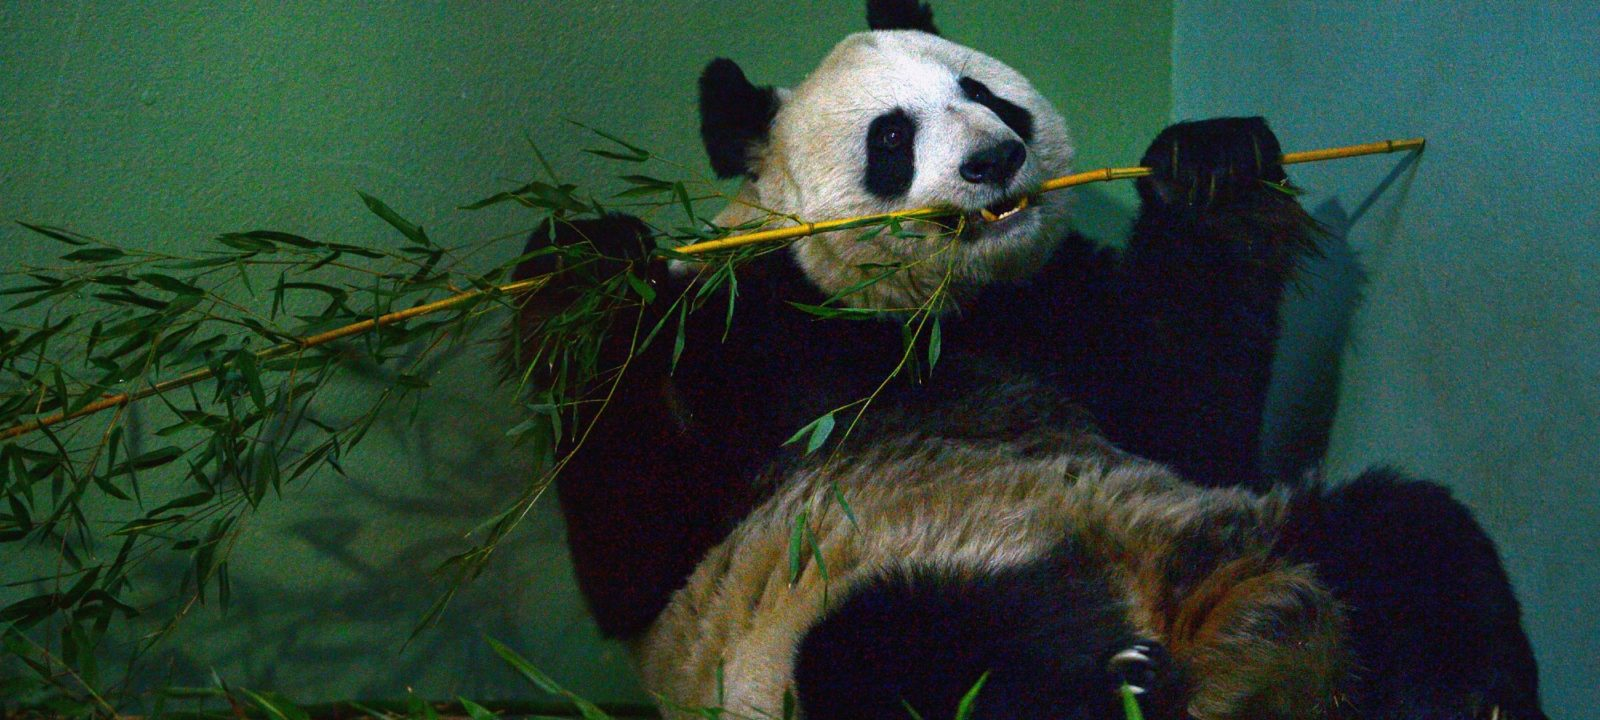 A panda at Edinburgh Zoo